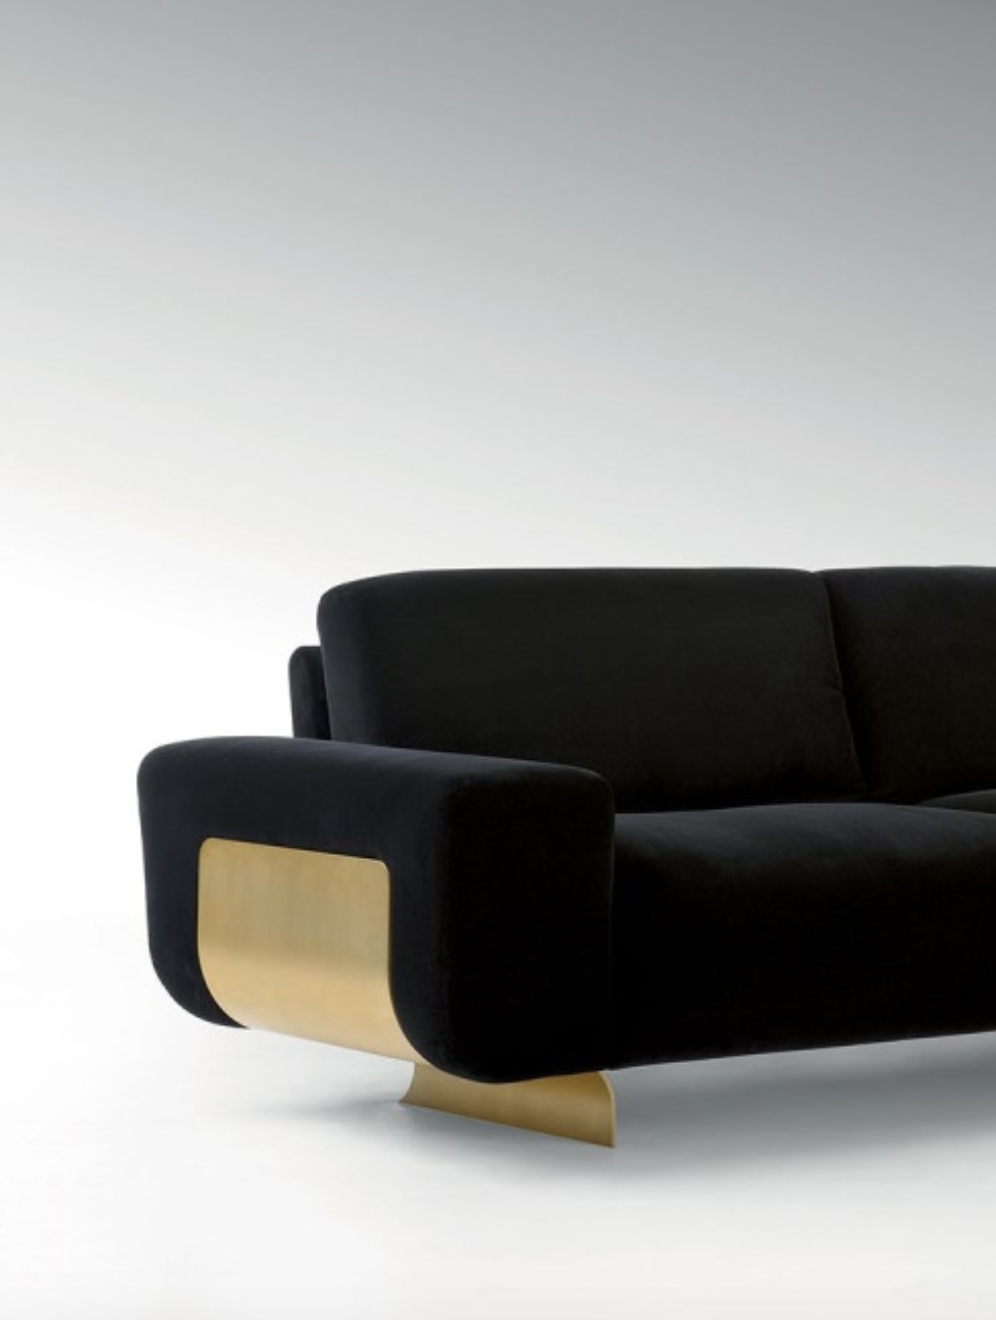 Admirable Fendi Casa Camelot Sofa Furniture Decor Fendi Alphanode Cool Chair Designs And Ideas Alphanodeonline